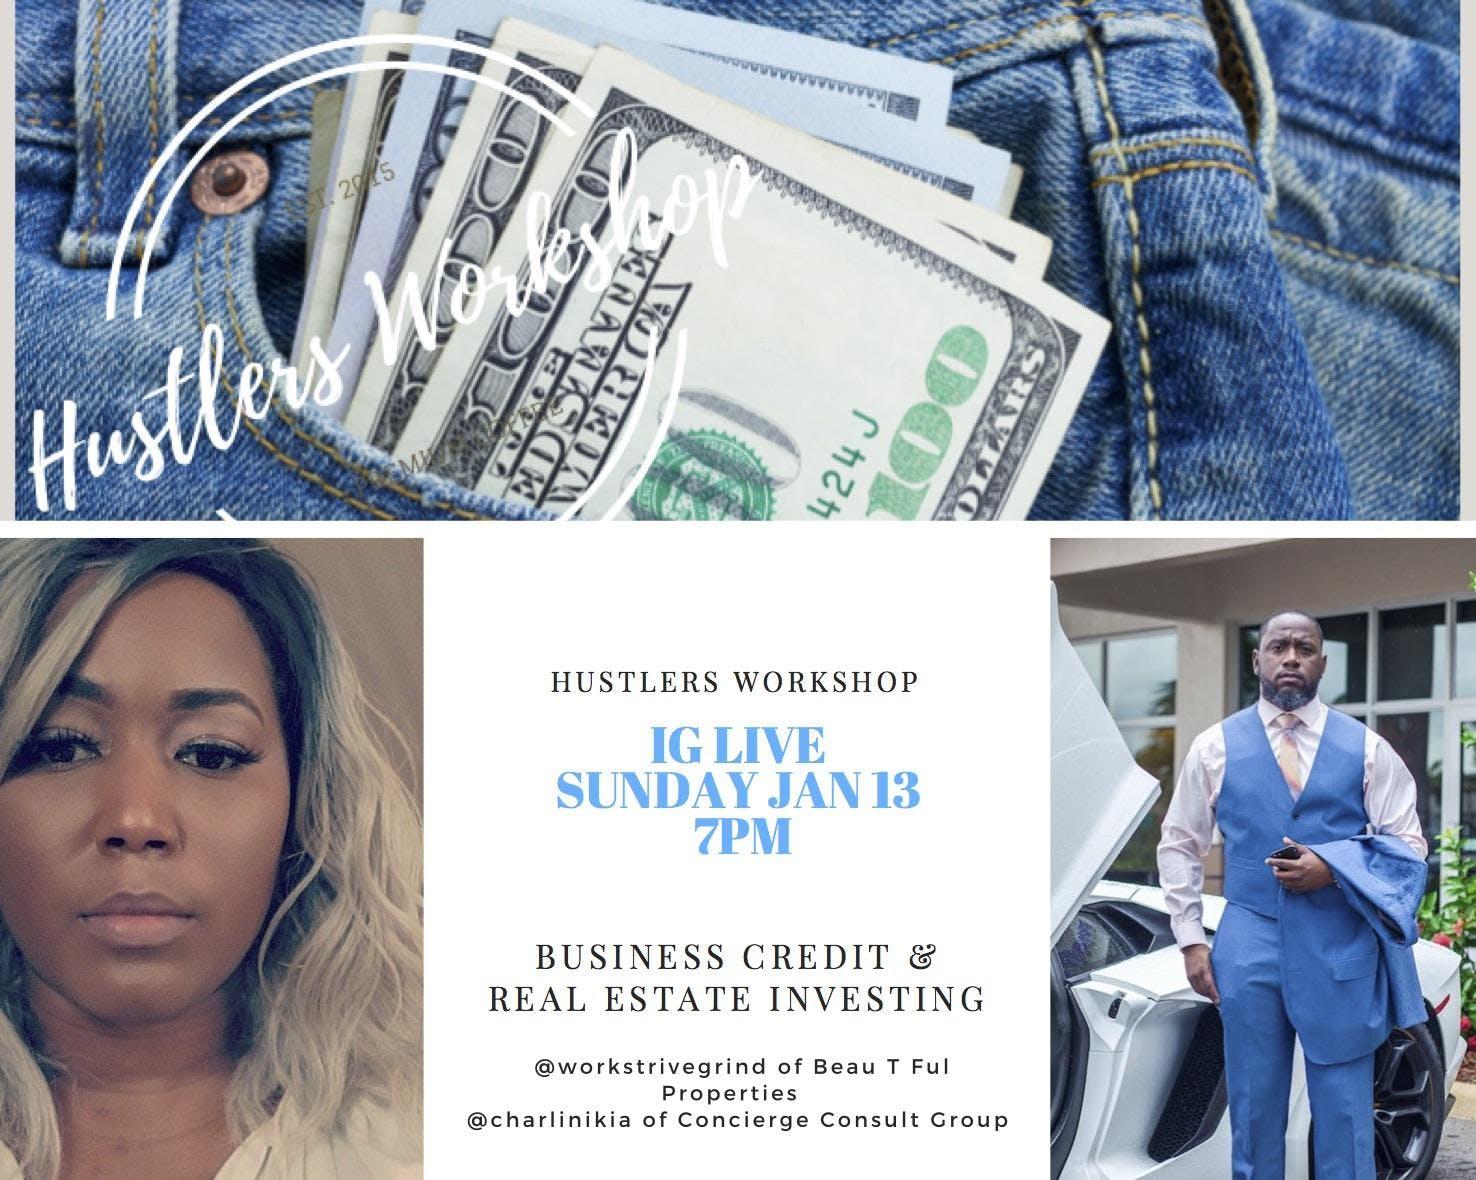 Hustlers Workshop Business and Real Estate Investment Seminar